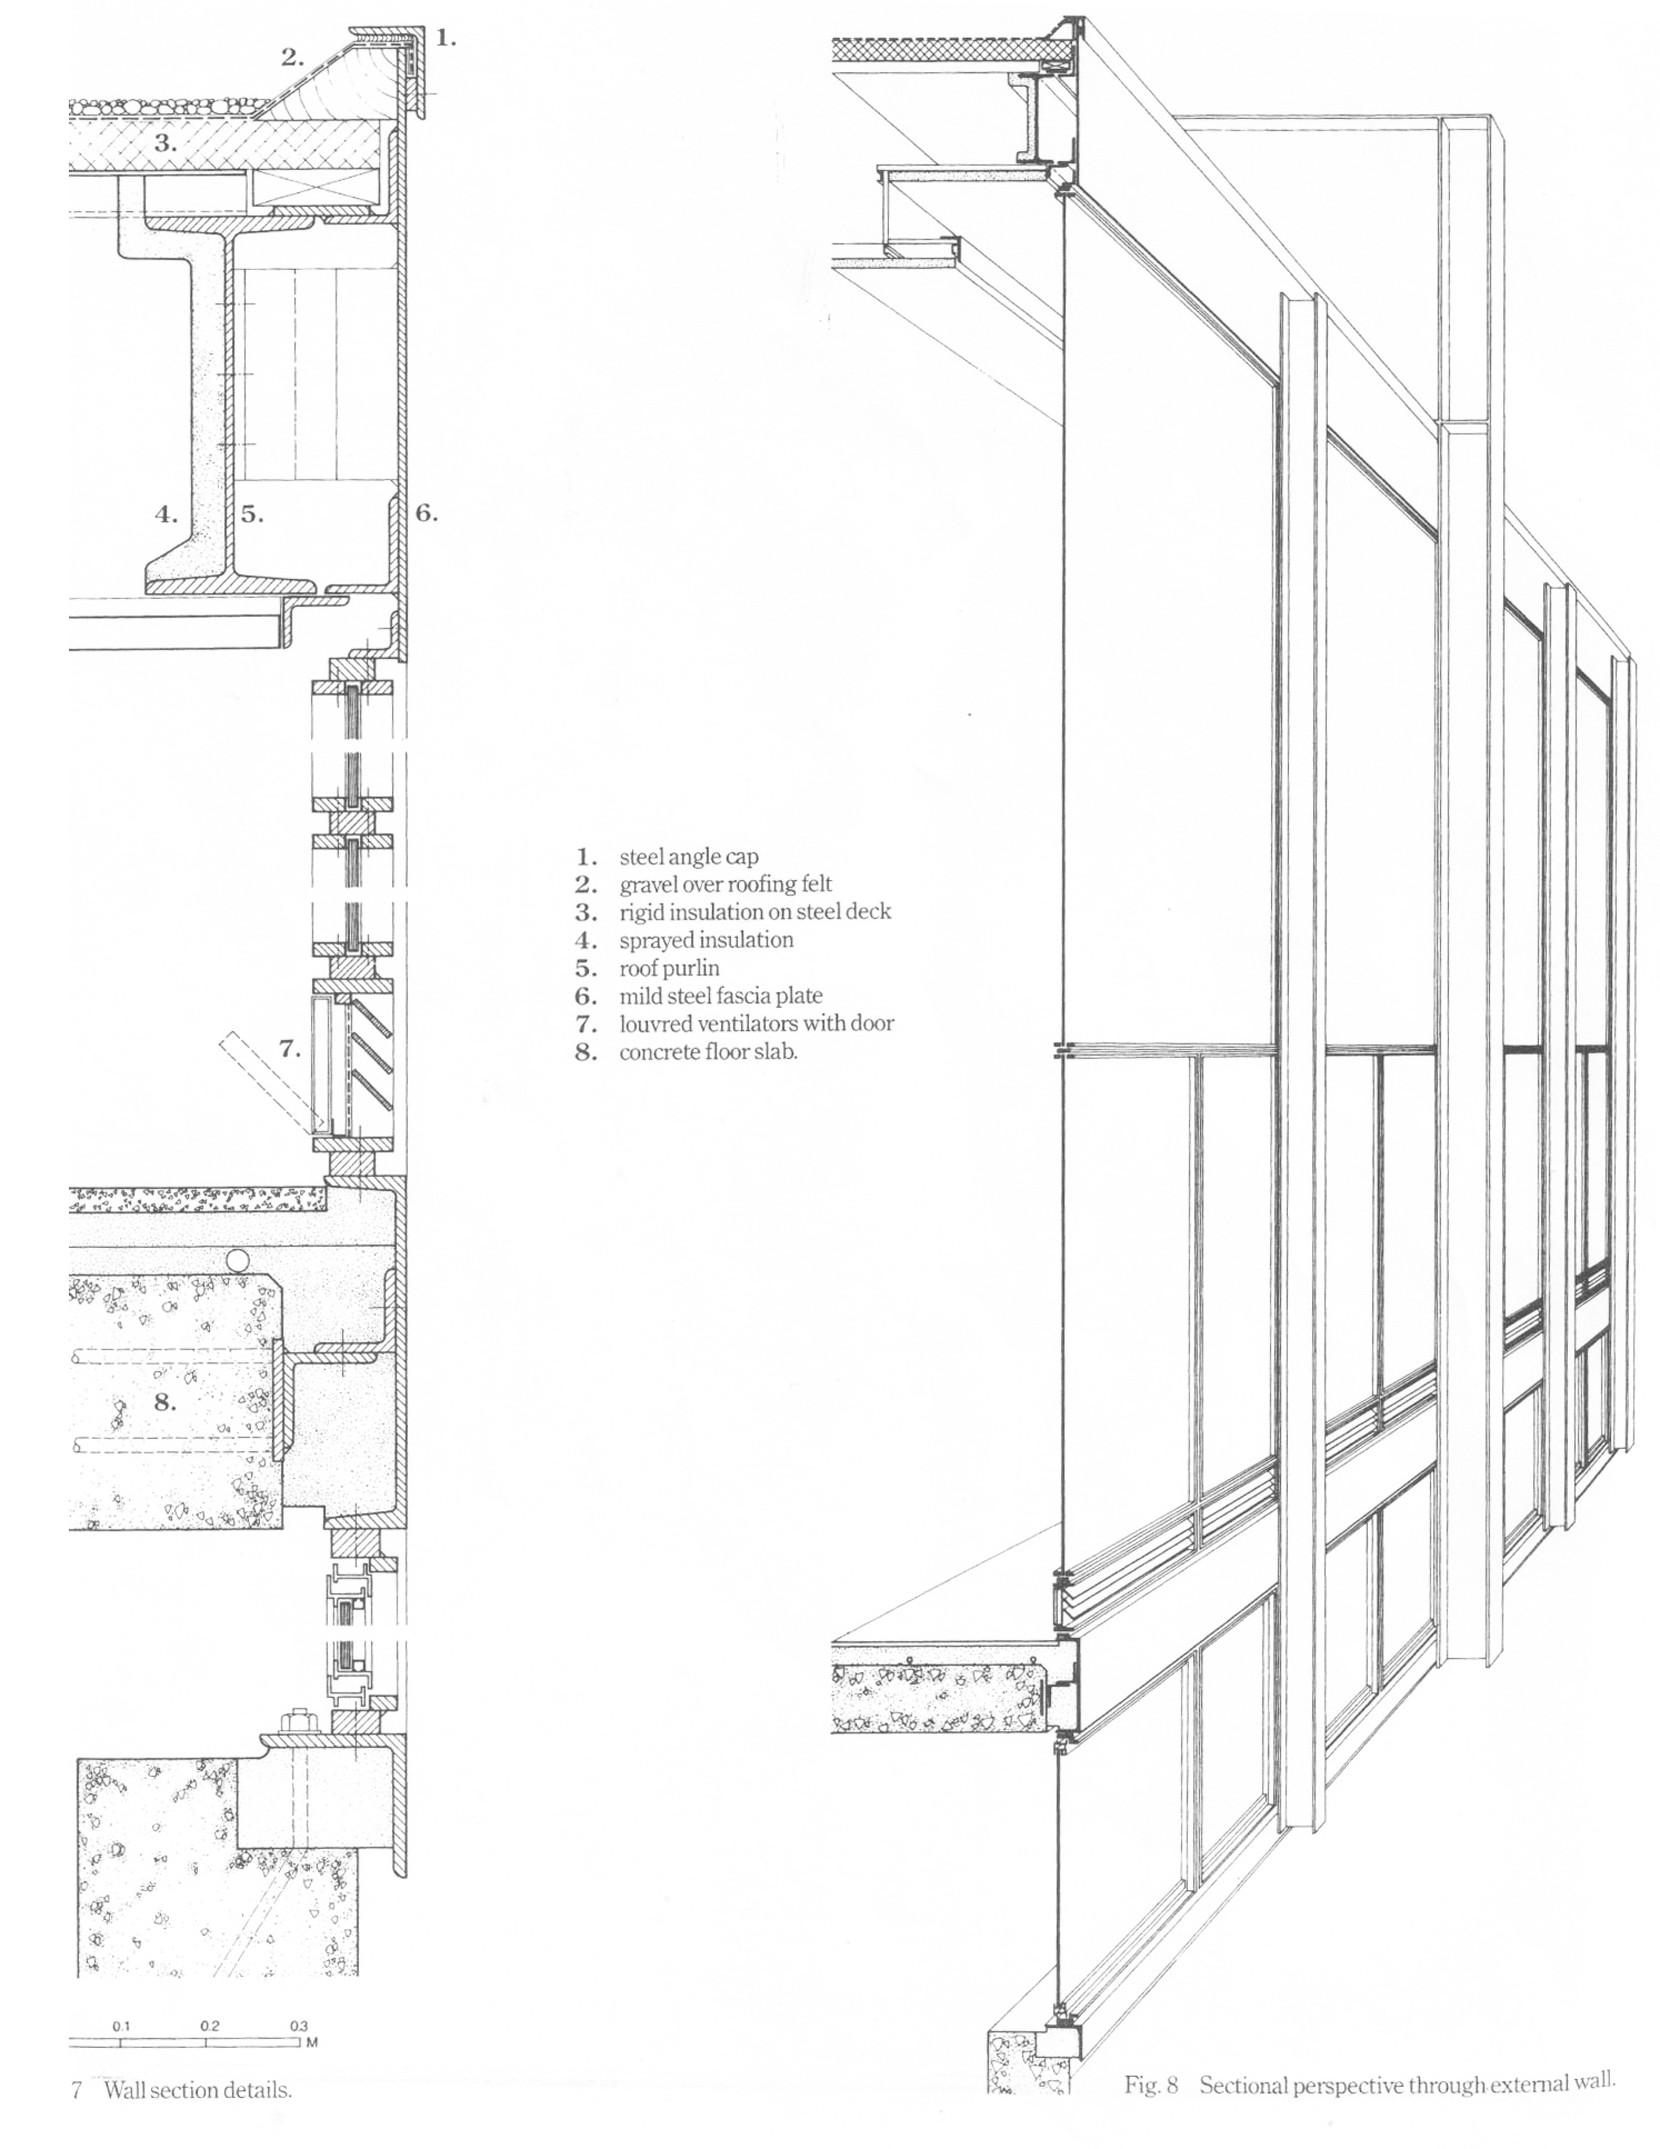 forest canopy diagram directv deca wiring galeria de arquivo: cortes perspectivados - 7